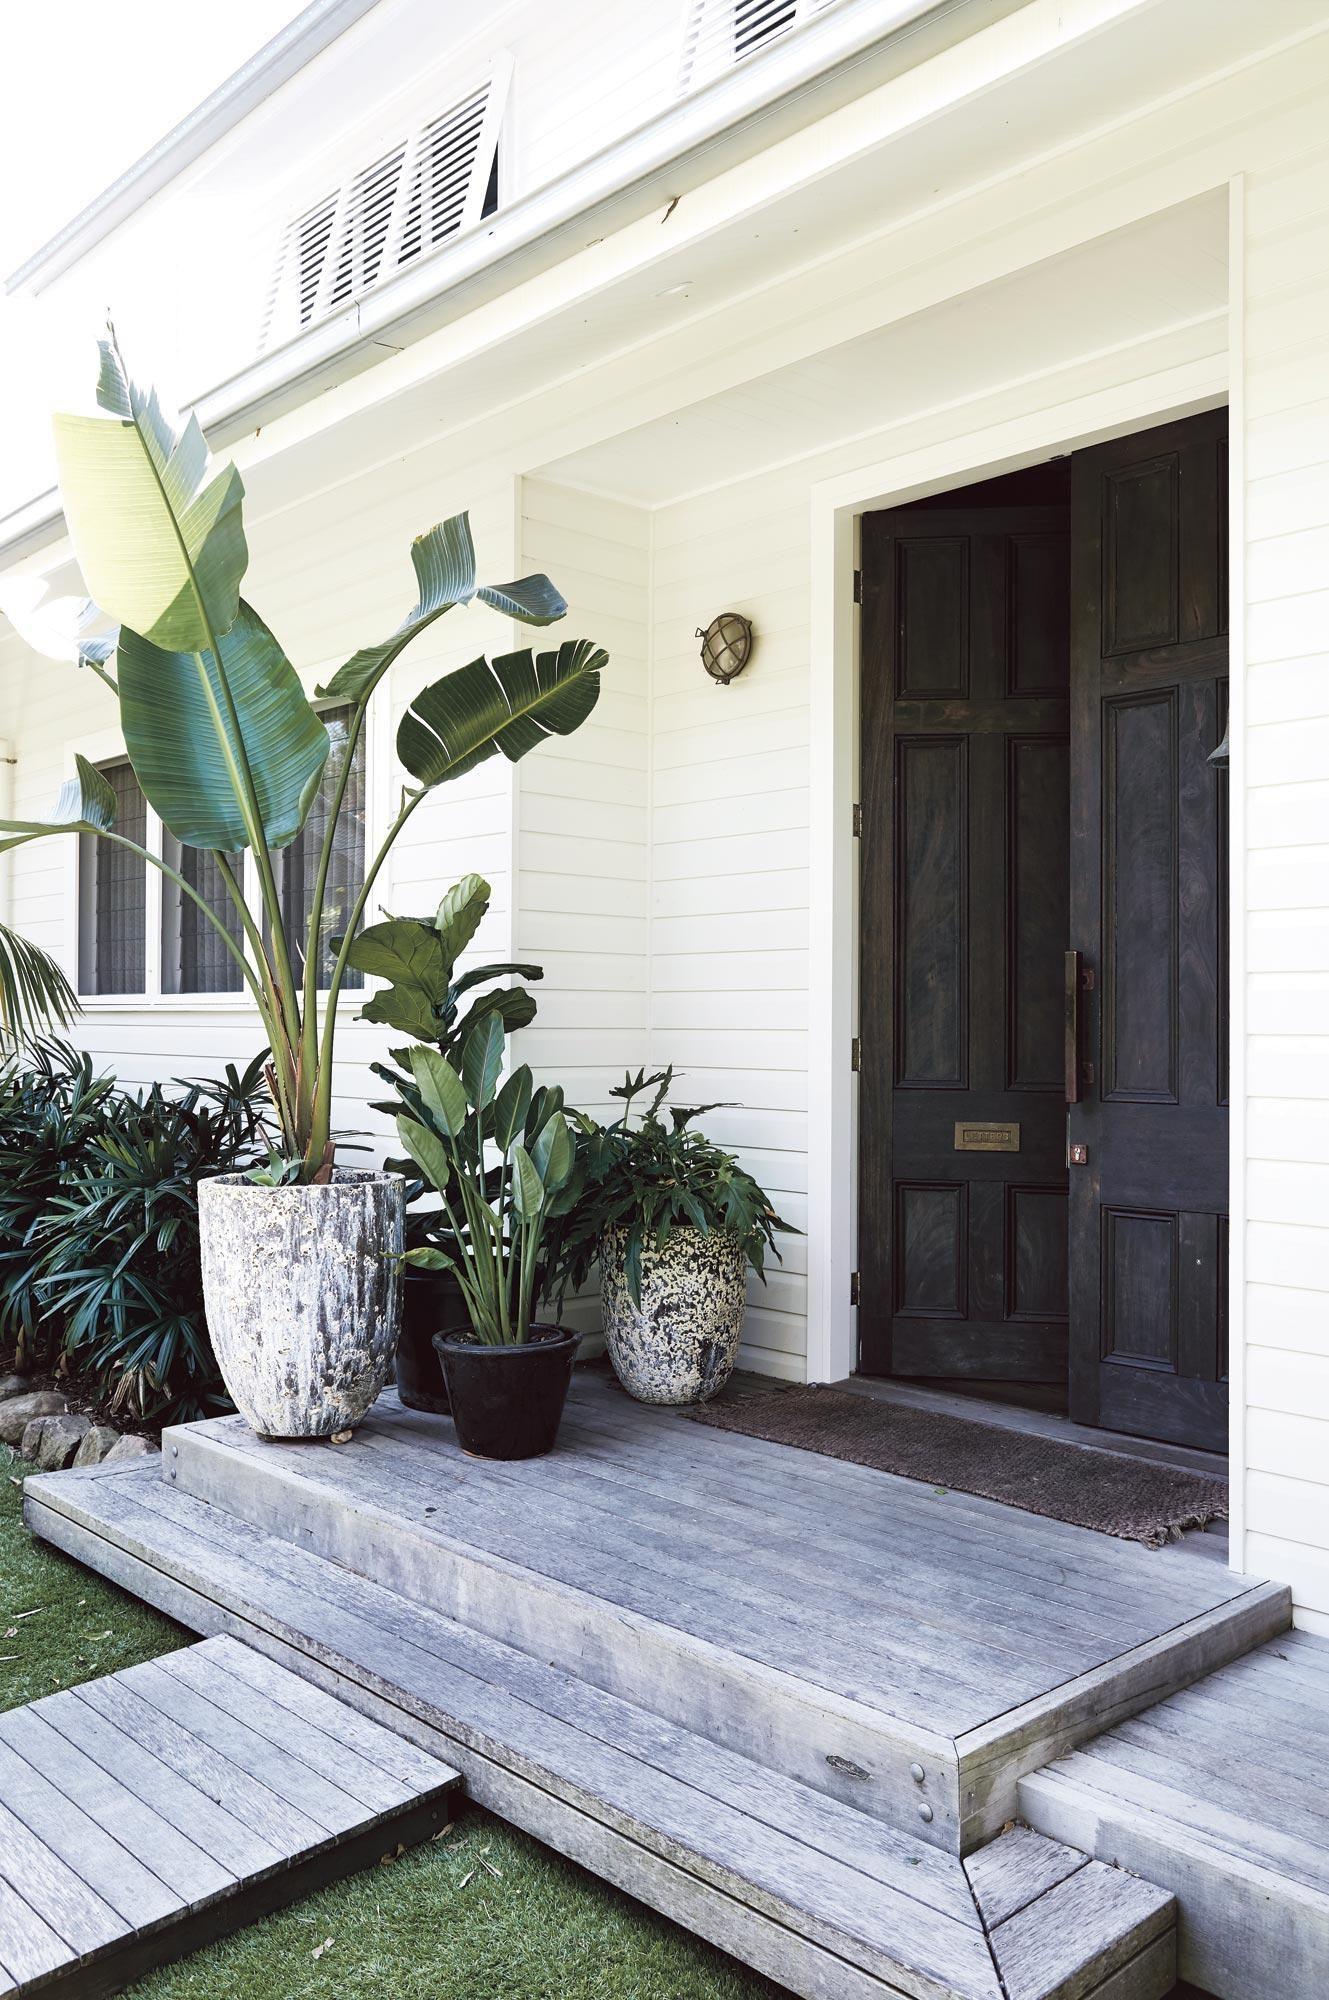 17 Inspiring Coastal Decor Diy Ideas Coastal Interiors Beach House Decor Coastal Cottage